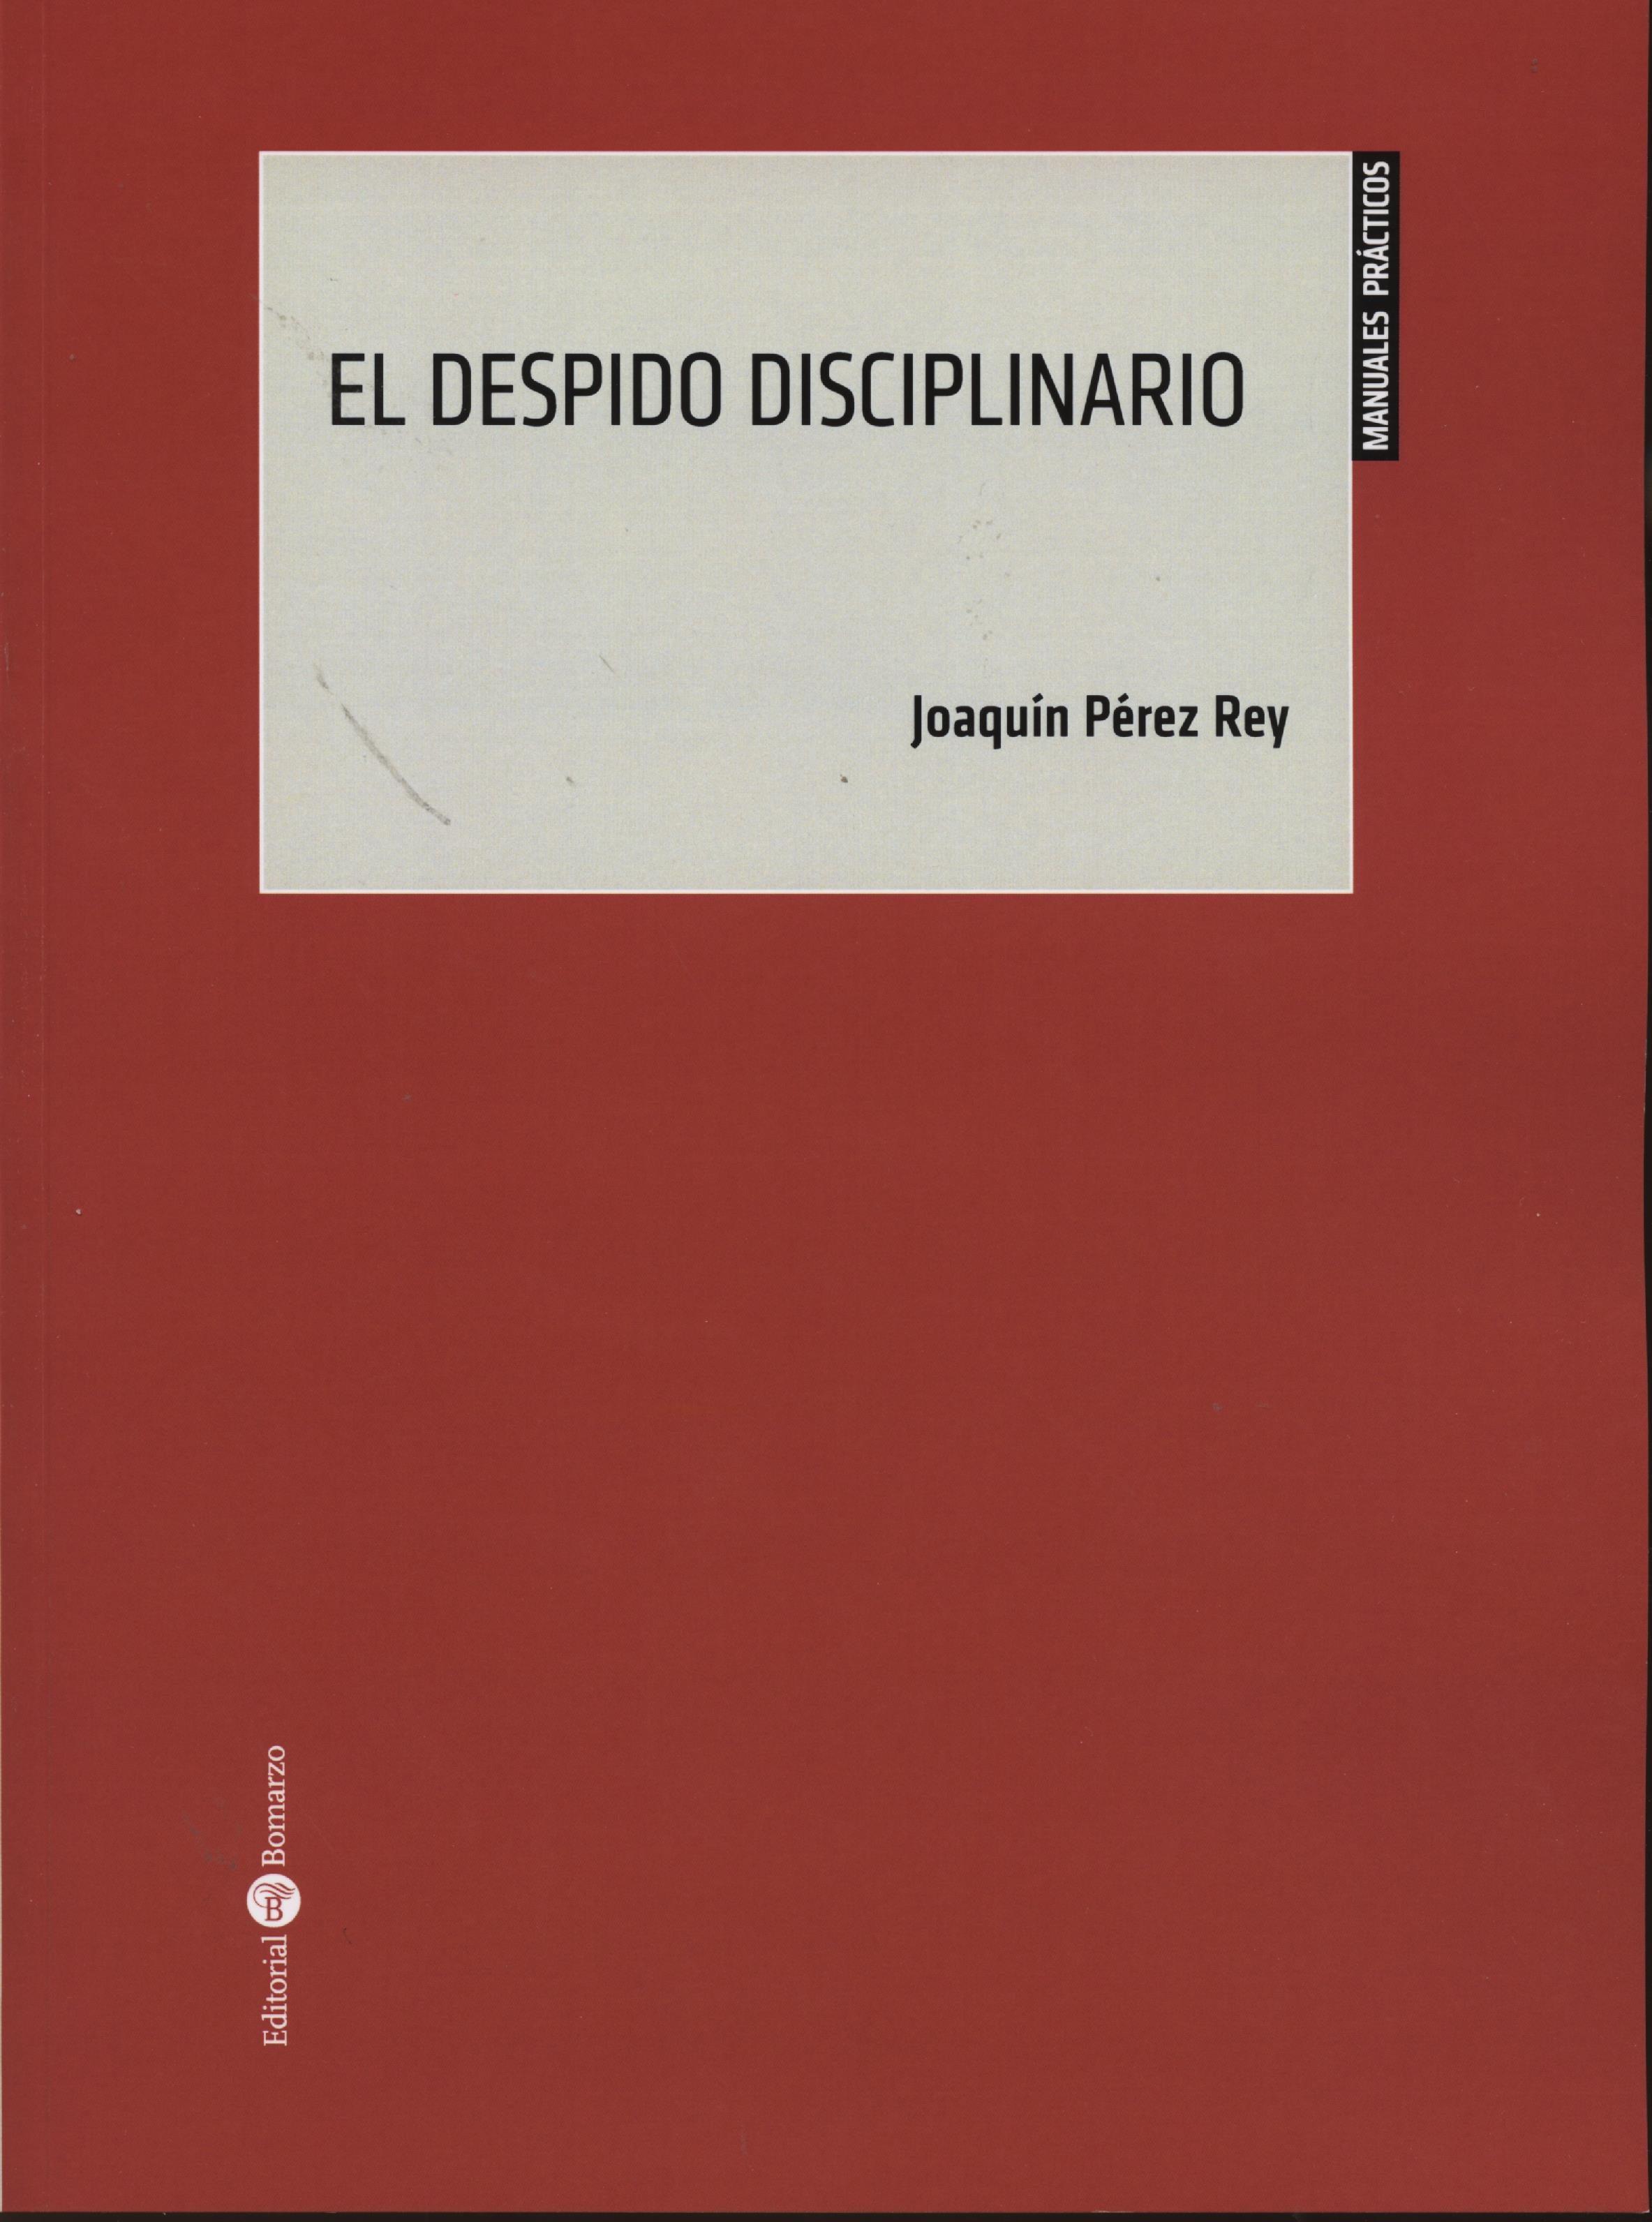 despido disciplinario-joaquin perez rey-9788415923107